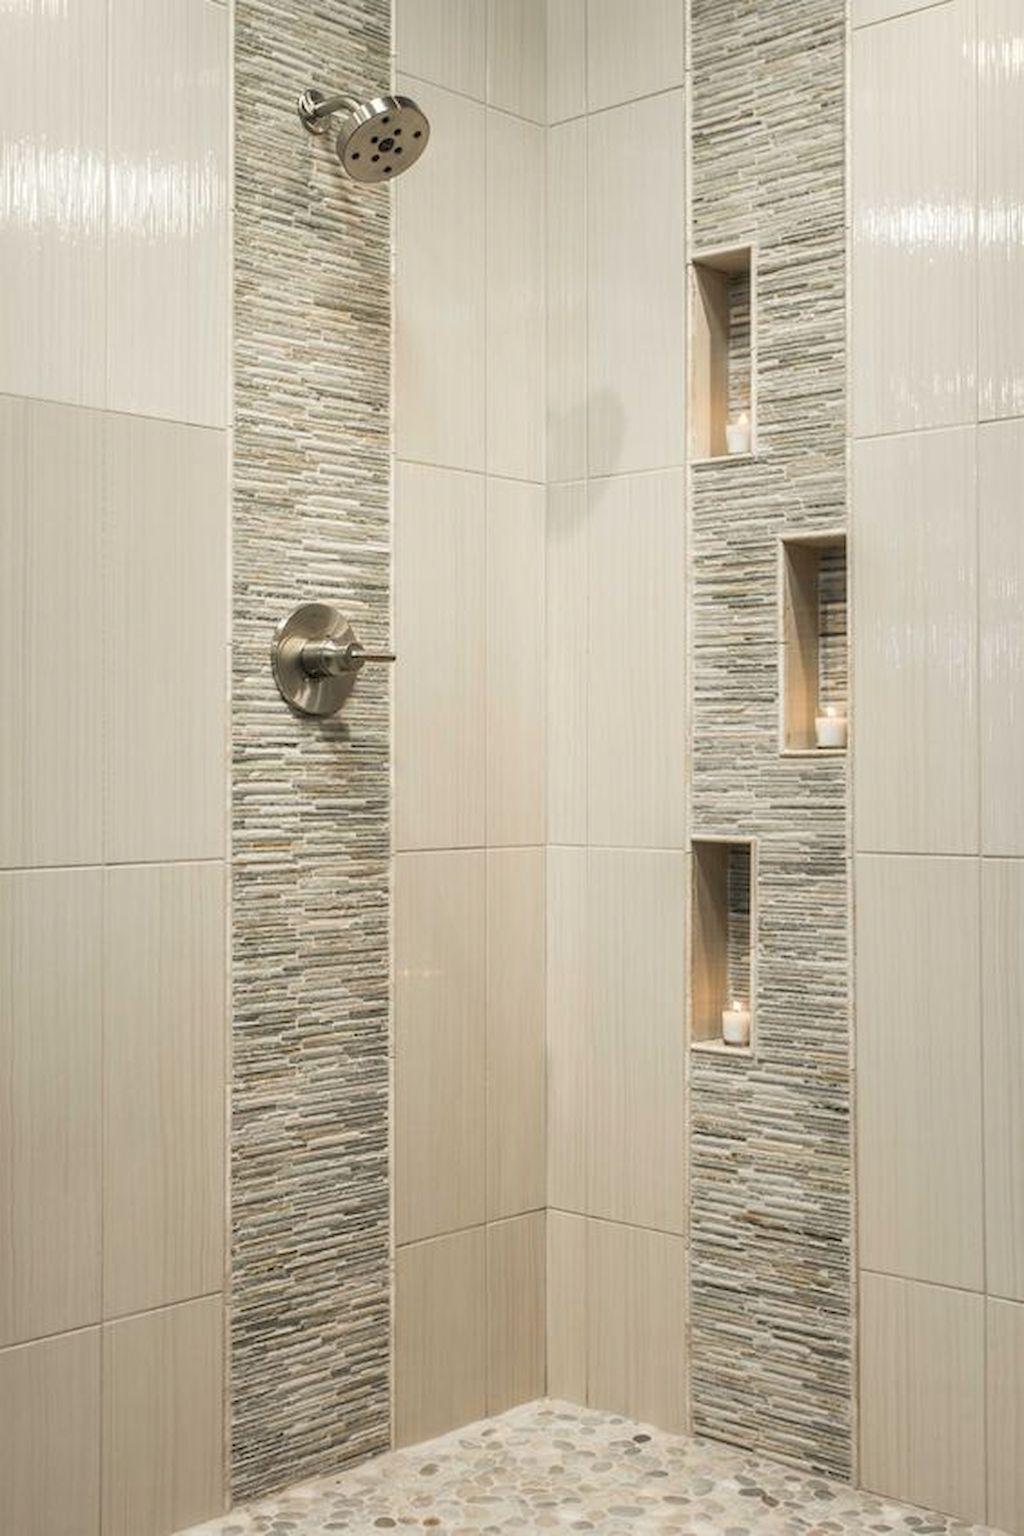 120 Stunning Bathroom Tile Shower Ideas | Tile showers, Bathroom ...